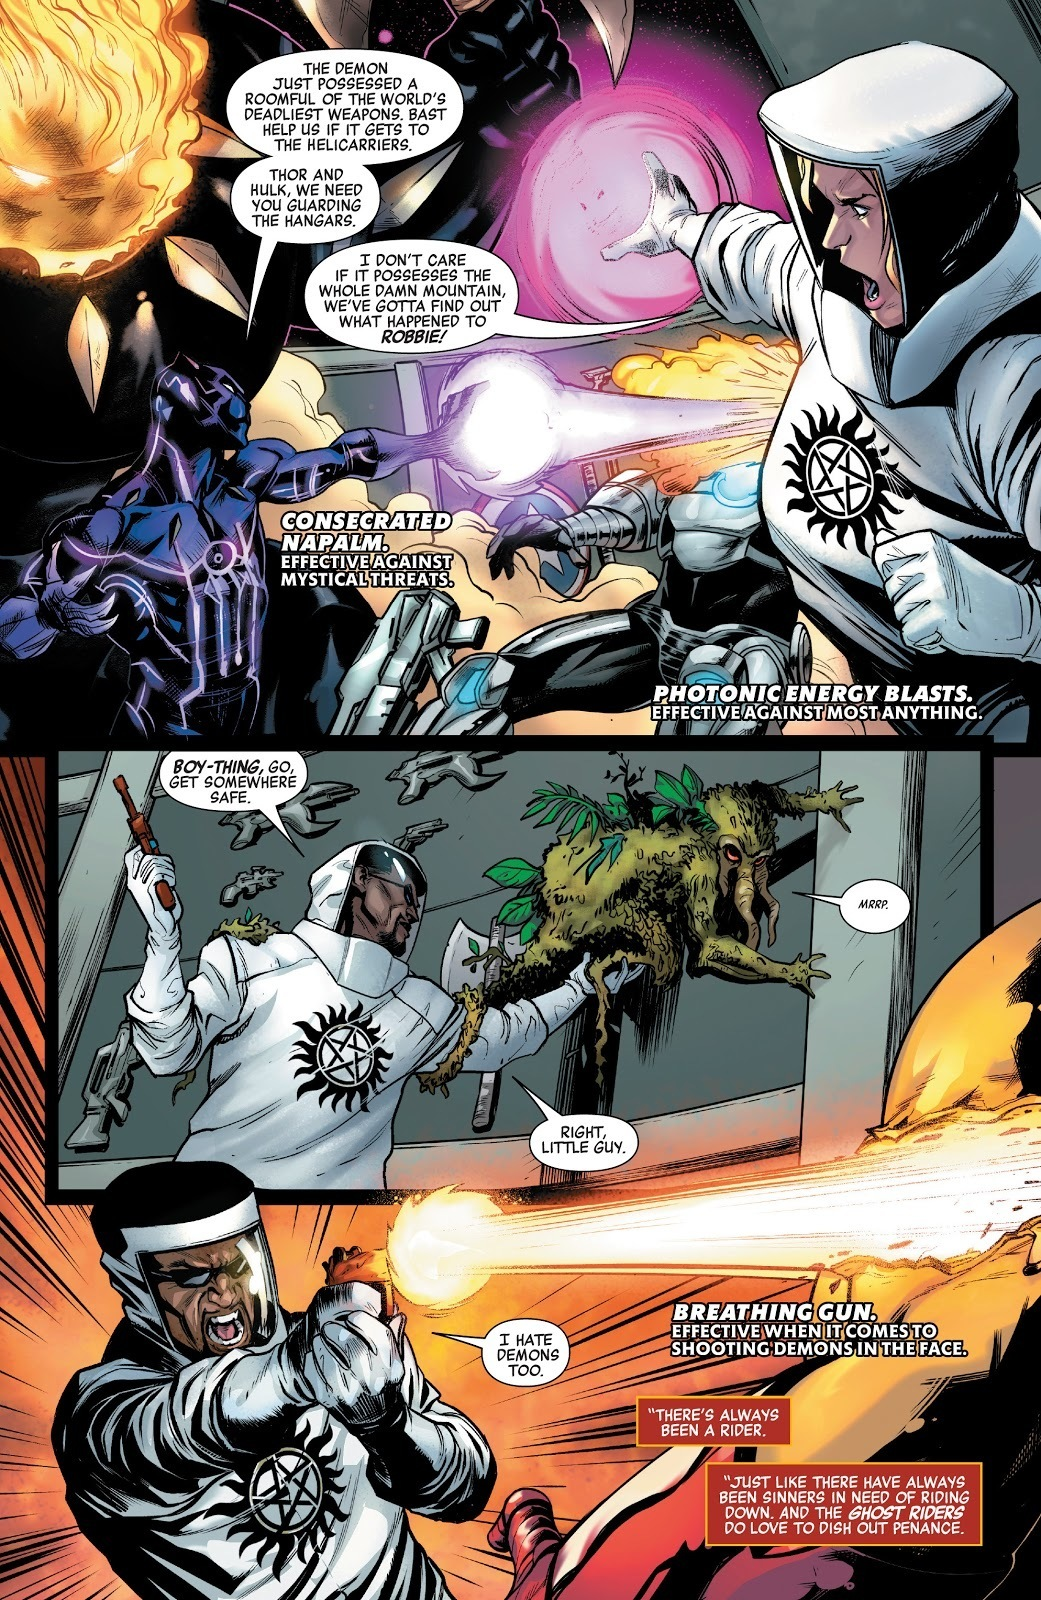 Avengers Vol. 8 #23